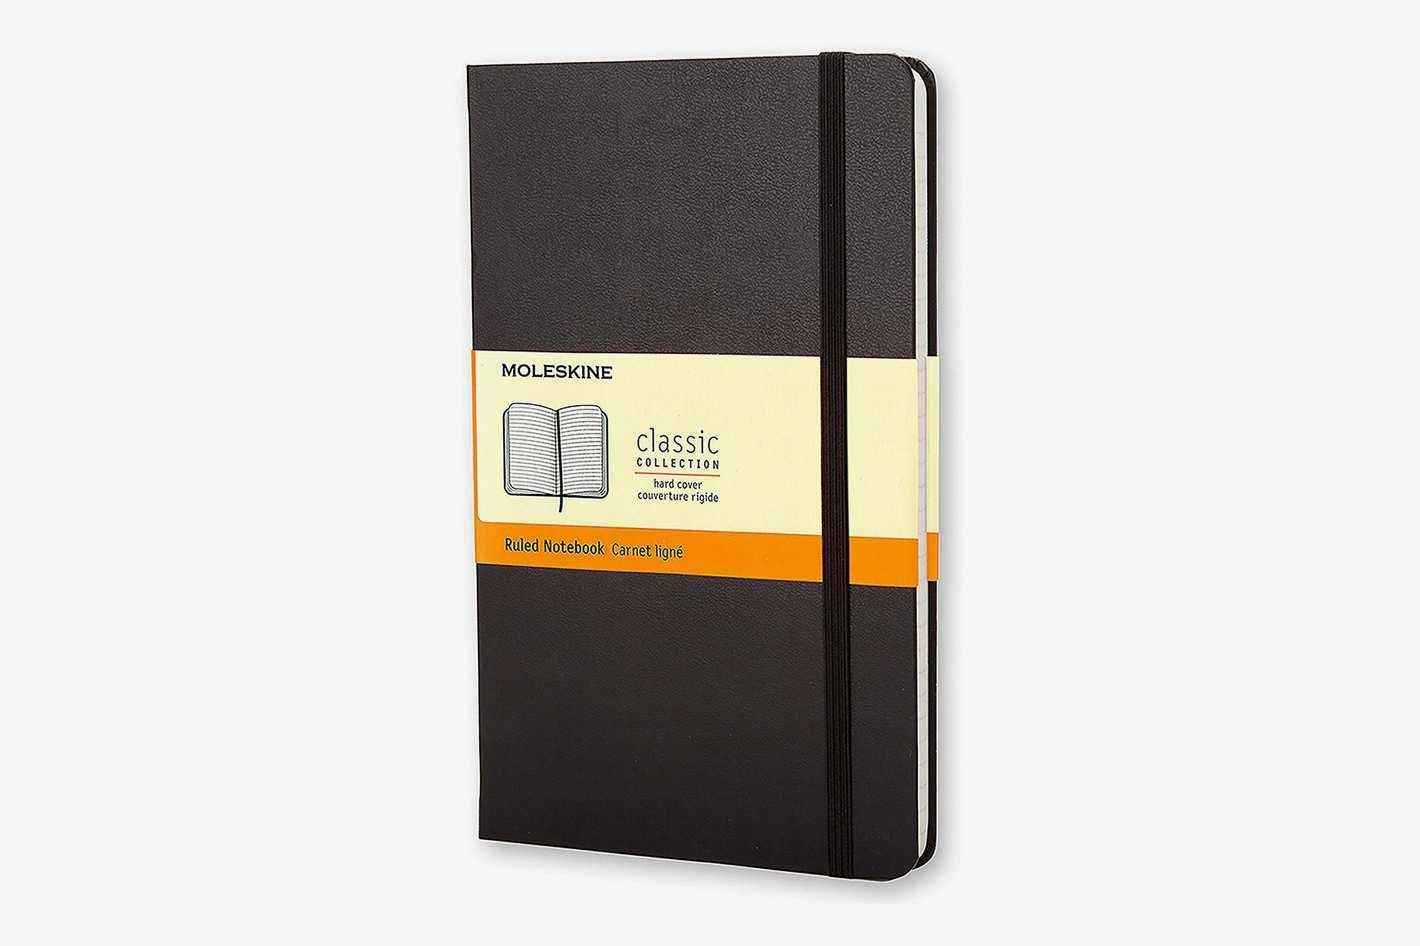 Moleskine Classic Notebook, Hardcover, Large